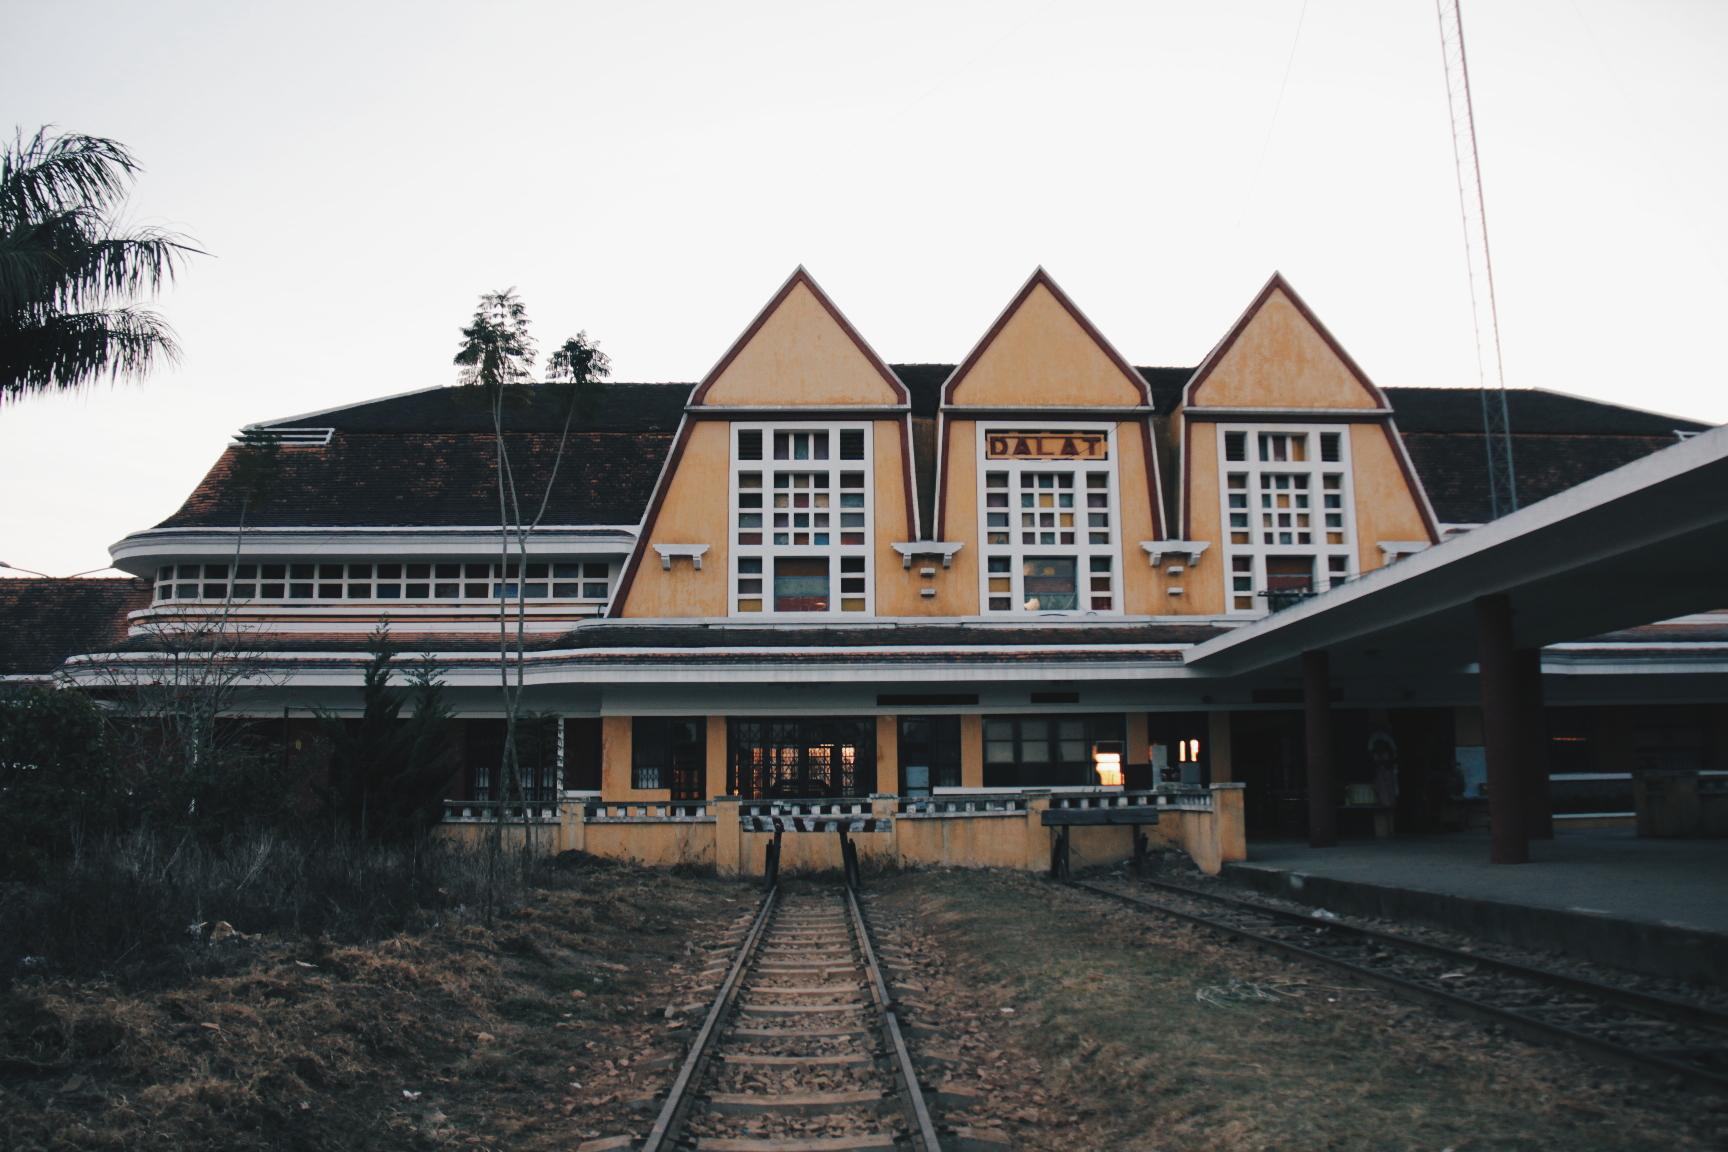 Da Lat, Vietnam Railway Station.